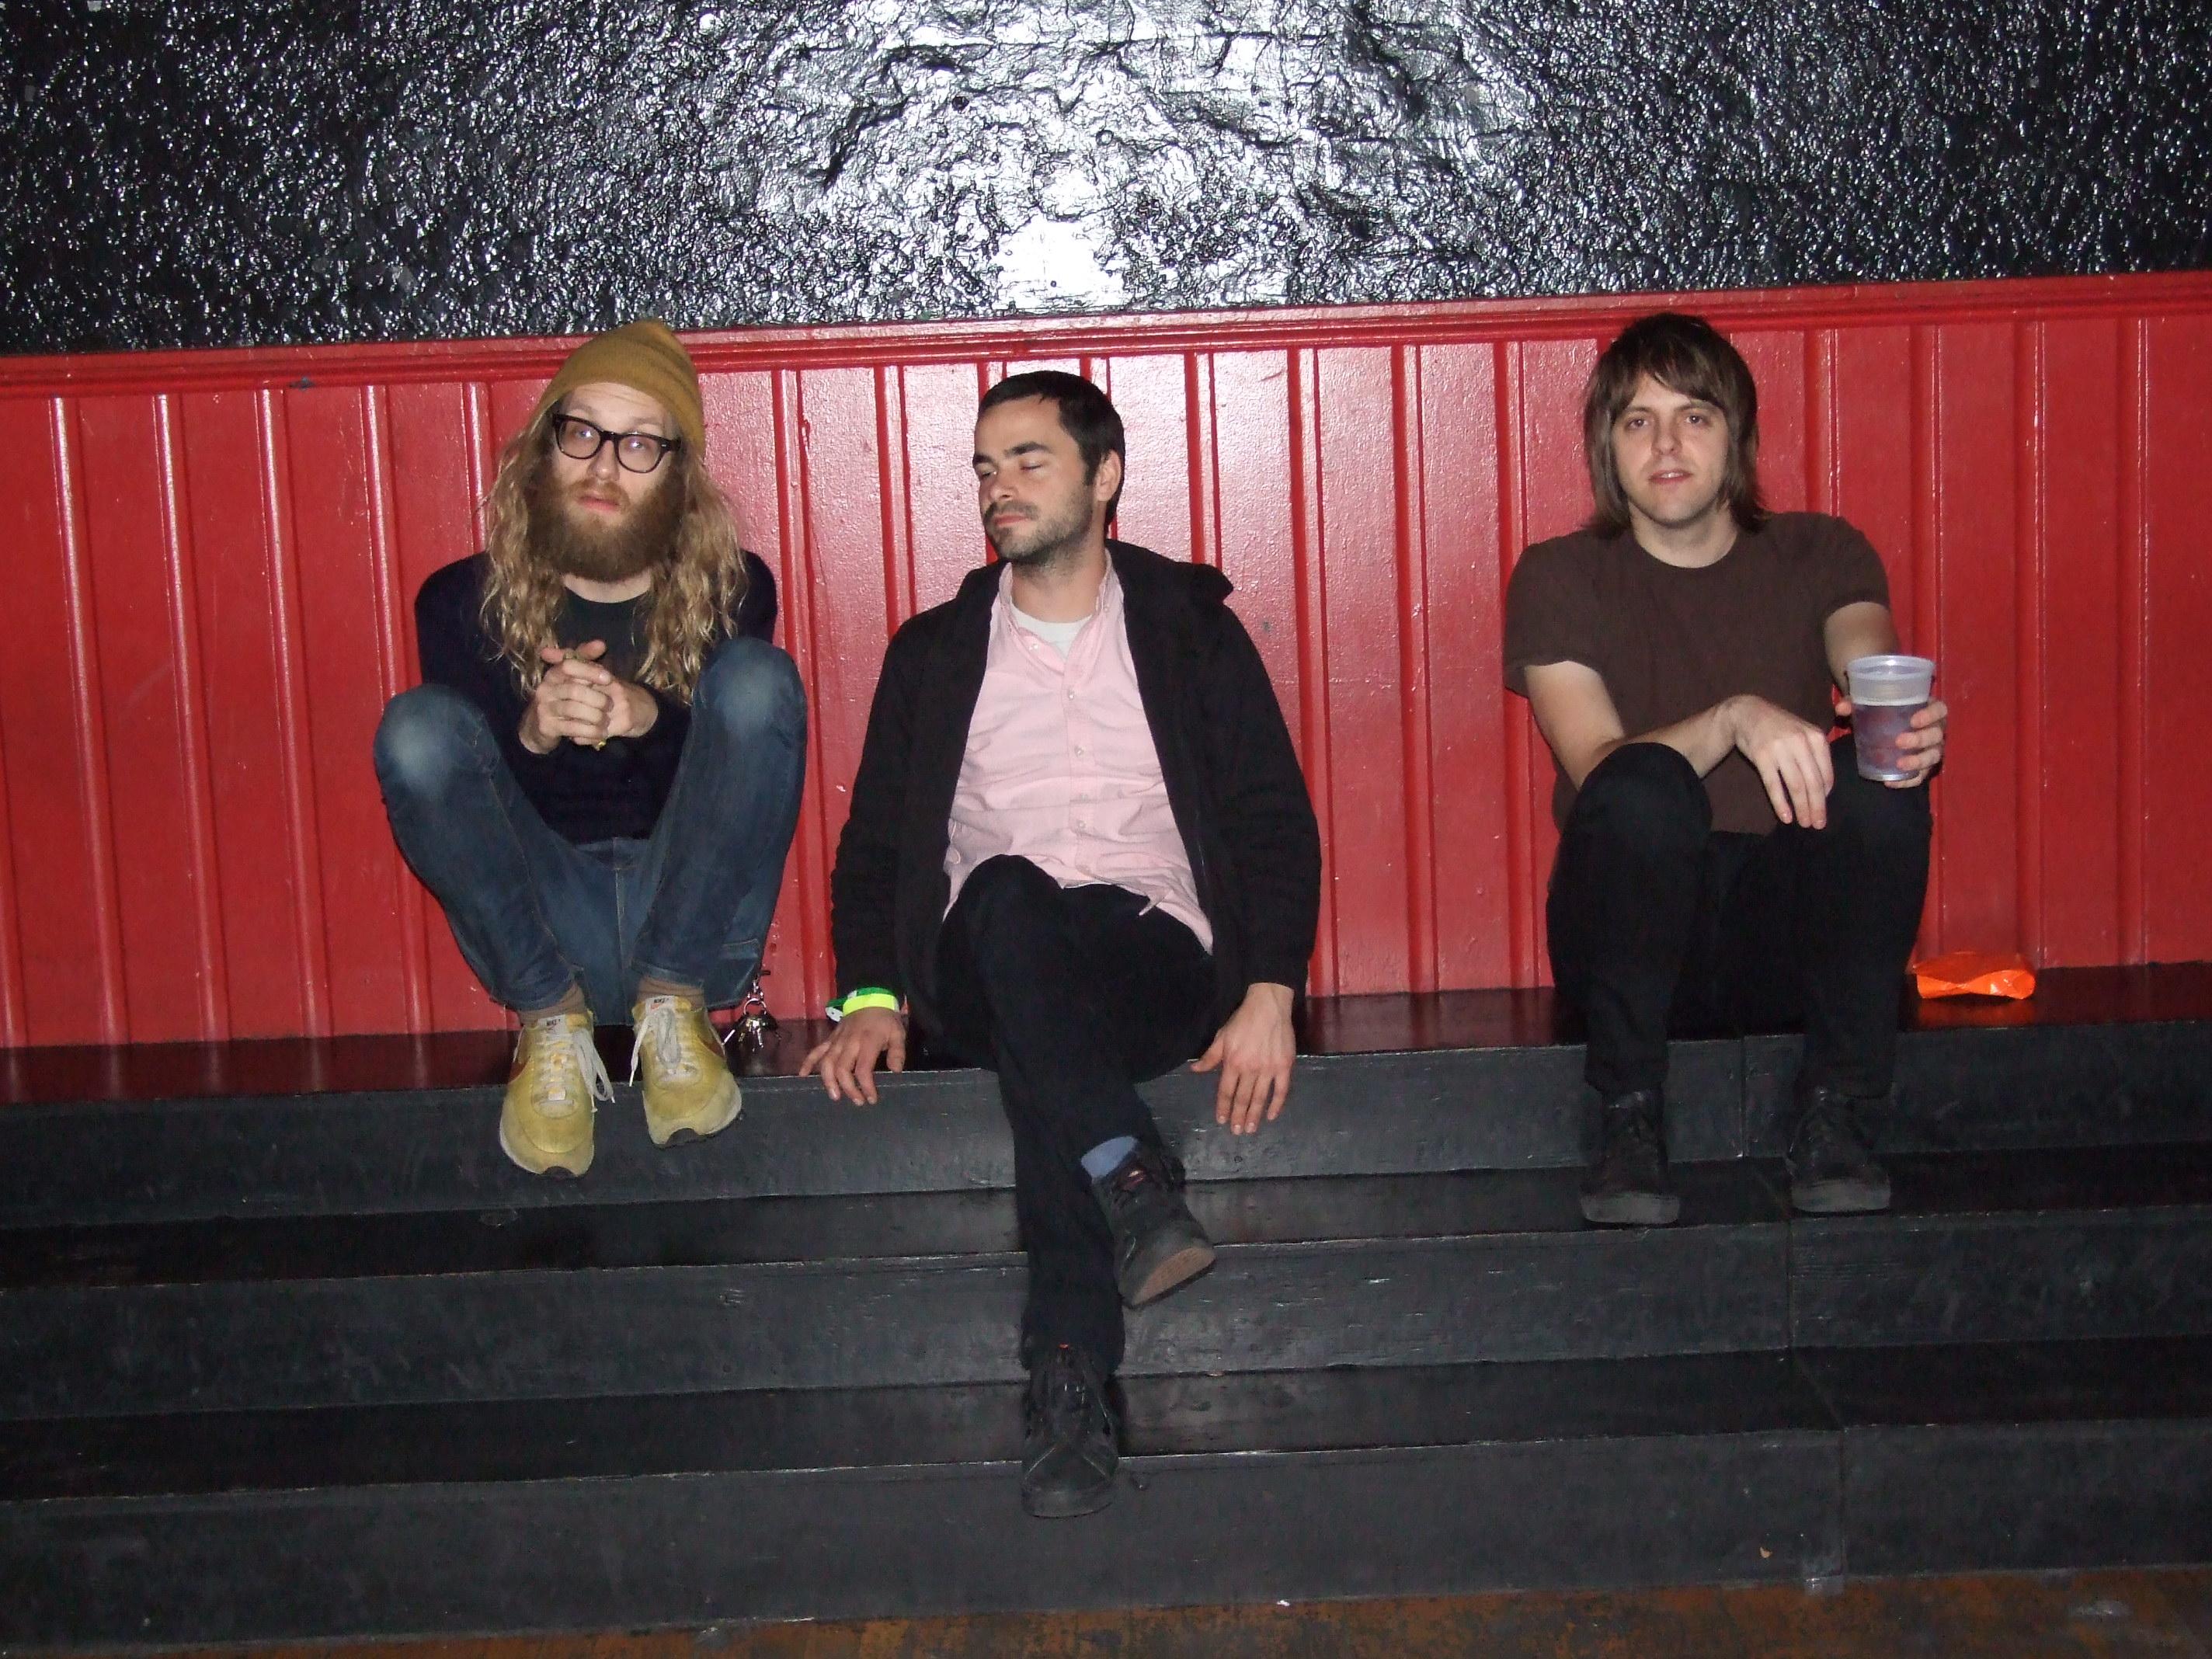 Times New Viking (sans Beth), Maxwells, Hoboken NJ